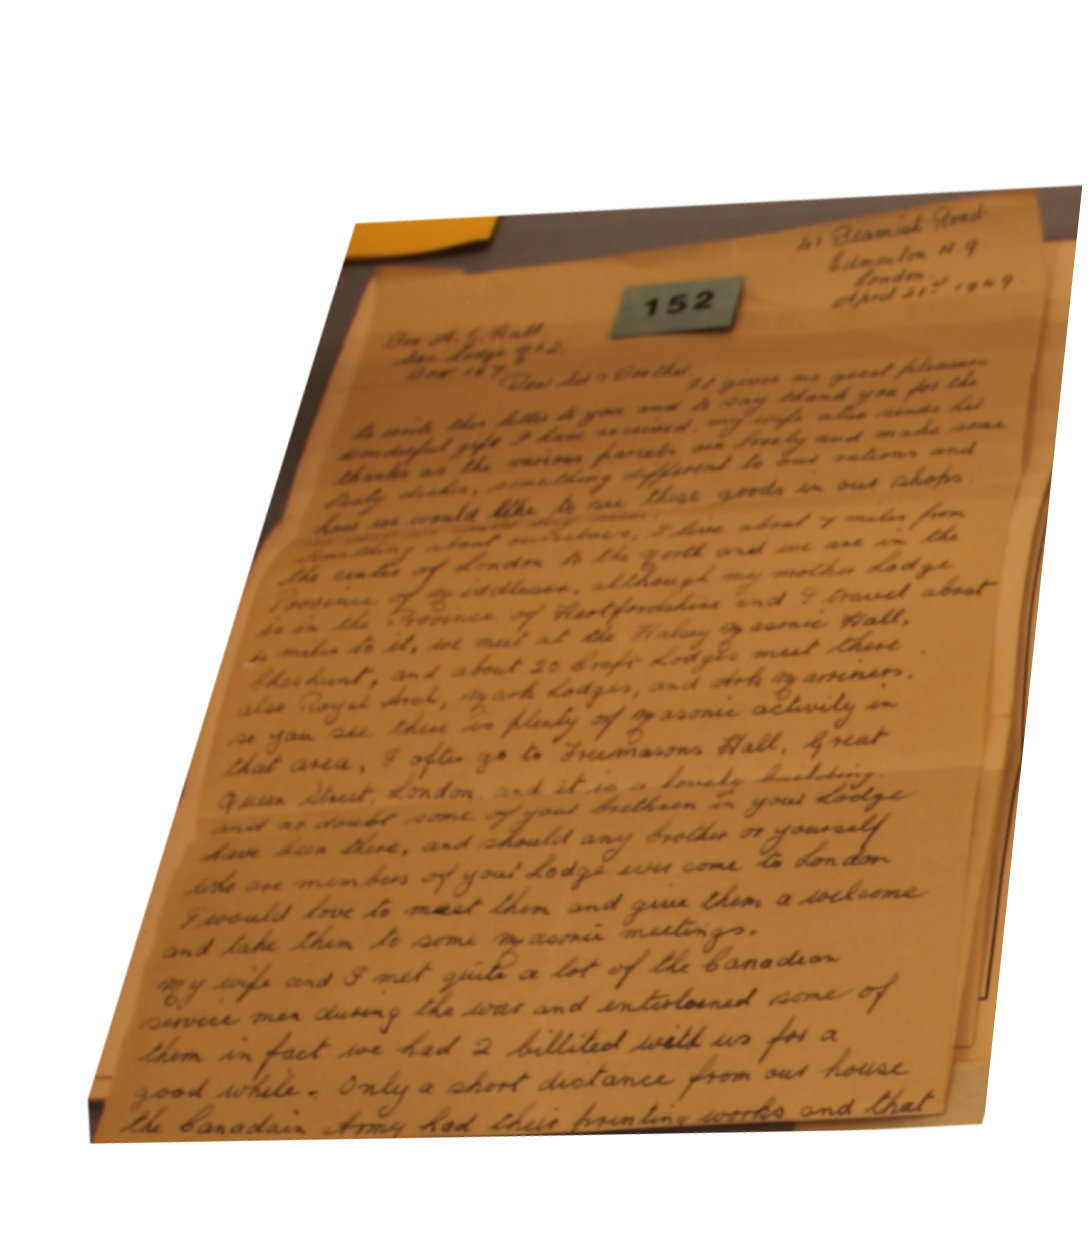 Letter of appreciation to Niagara Lodge, No. 2